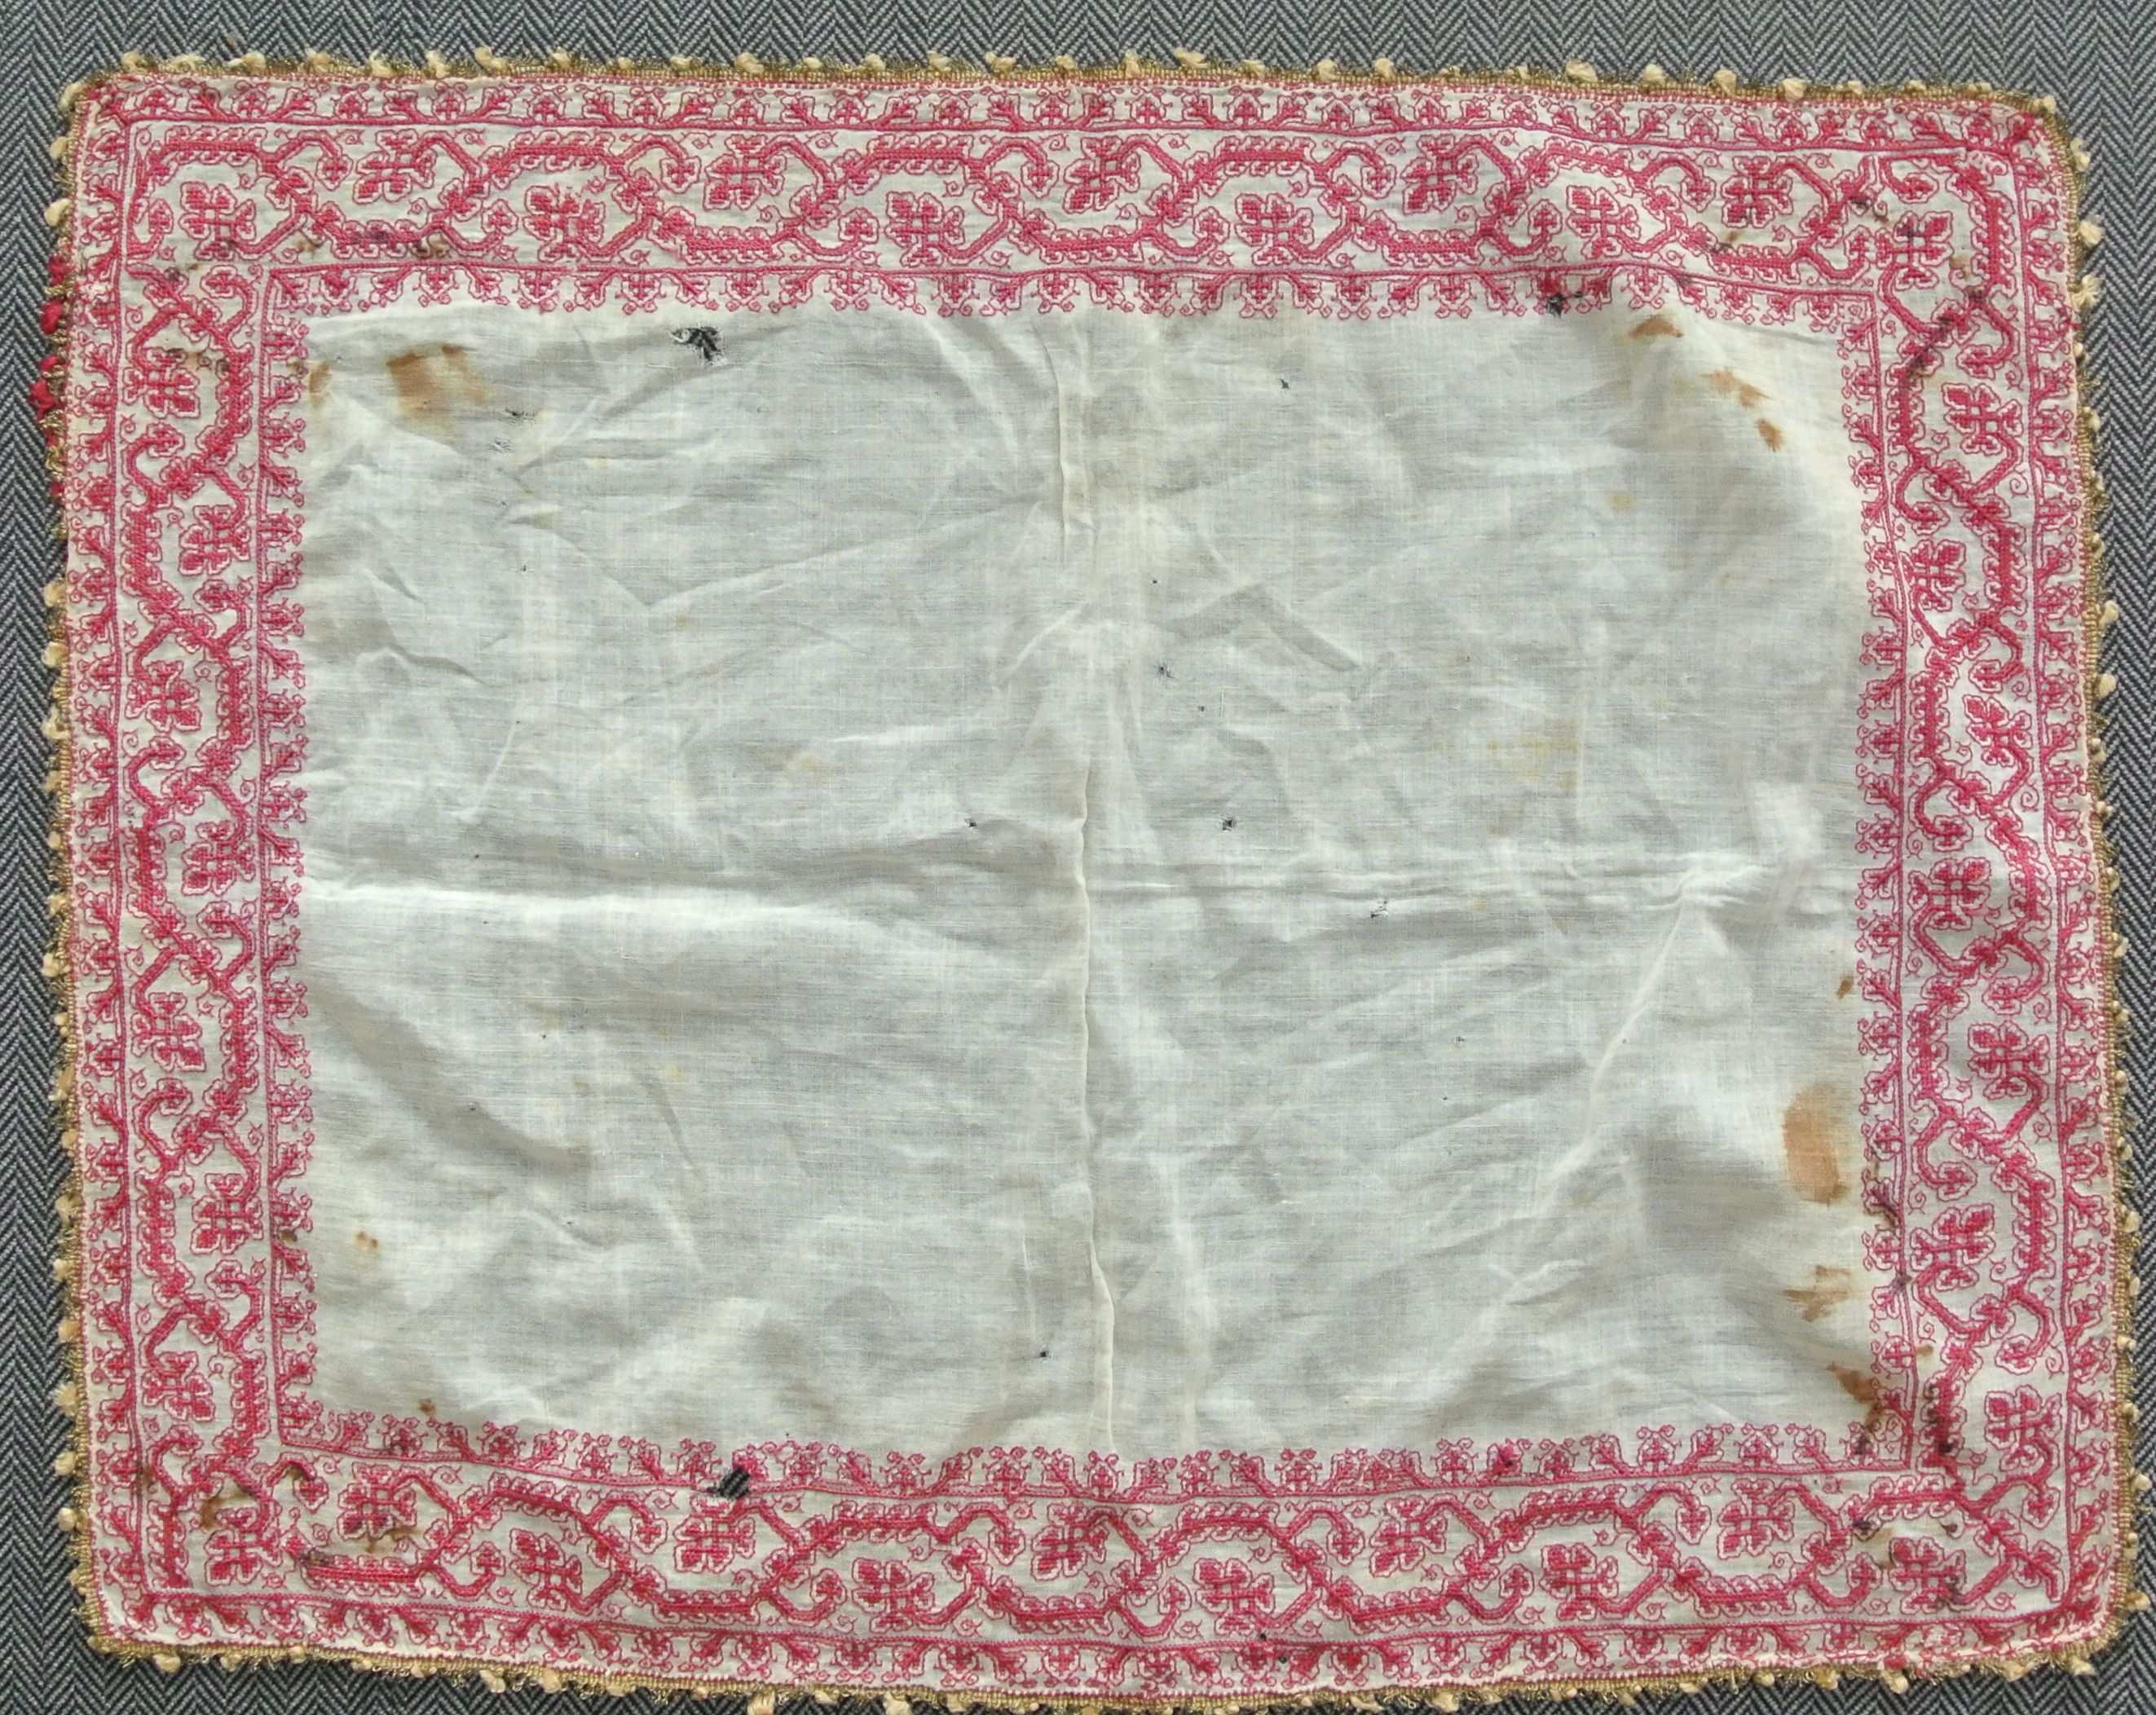 Fazzoletto Handkerchief Italy 16th Century Embroidery Textilien Handarbeit Kunst